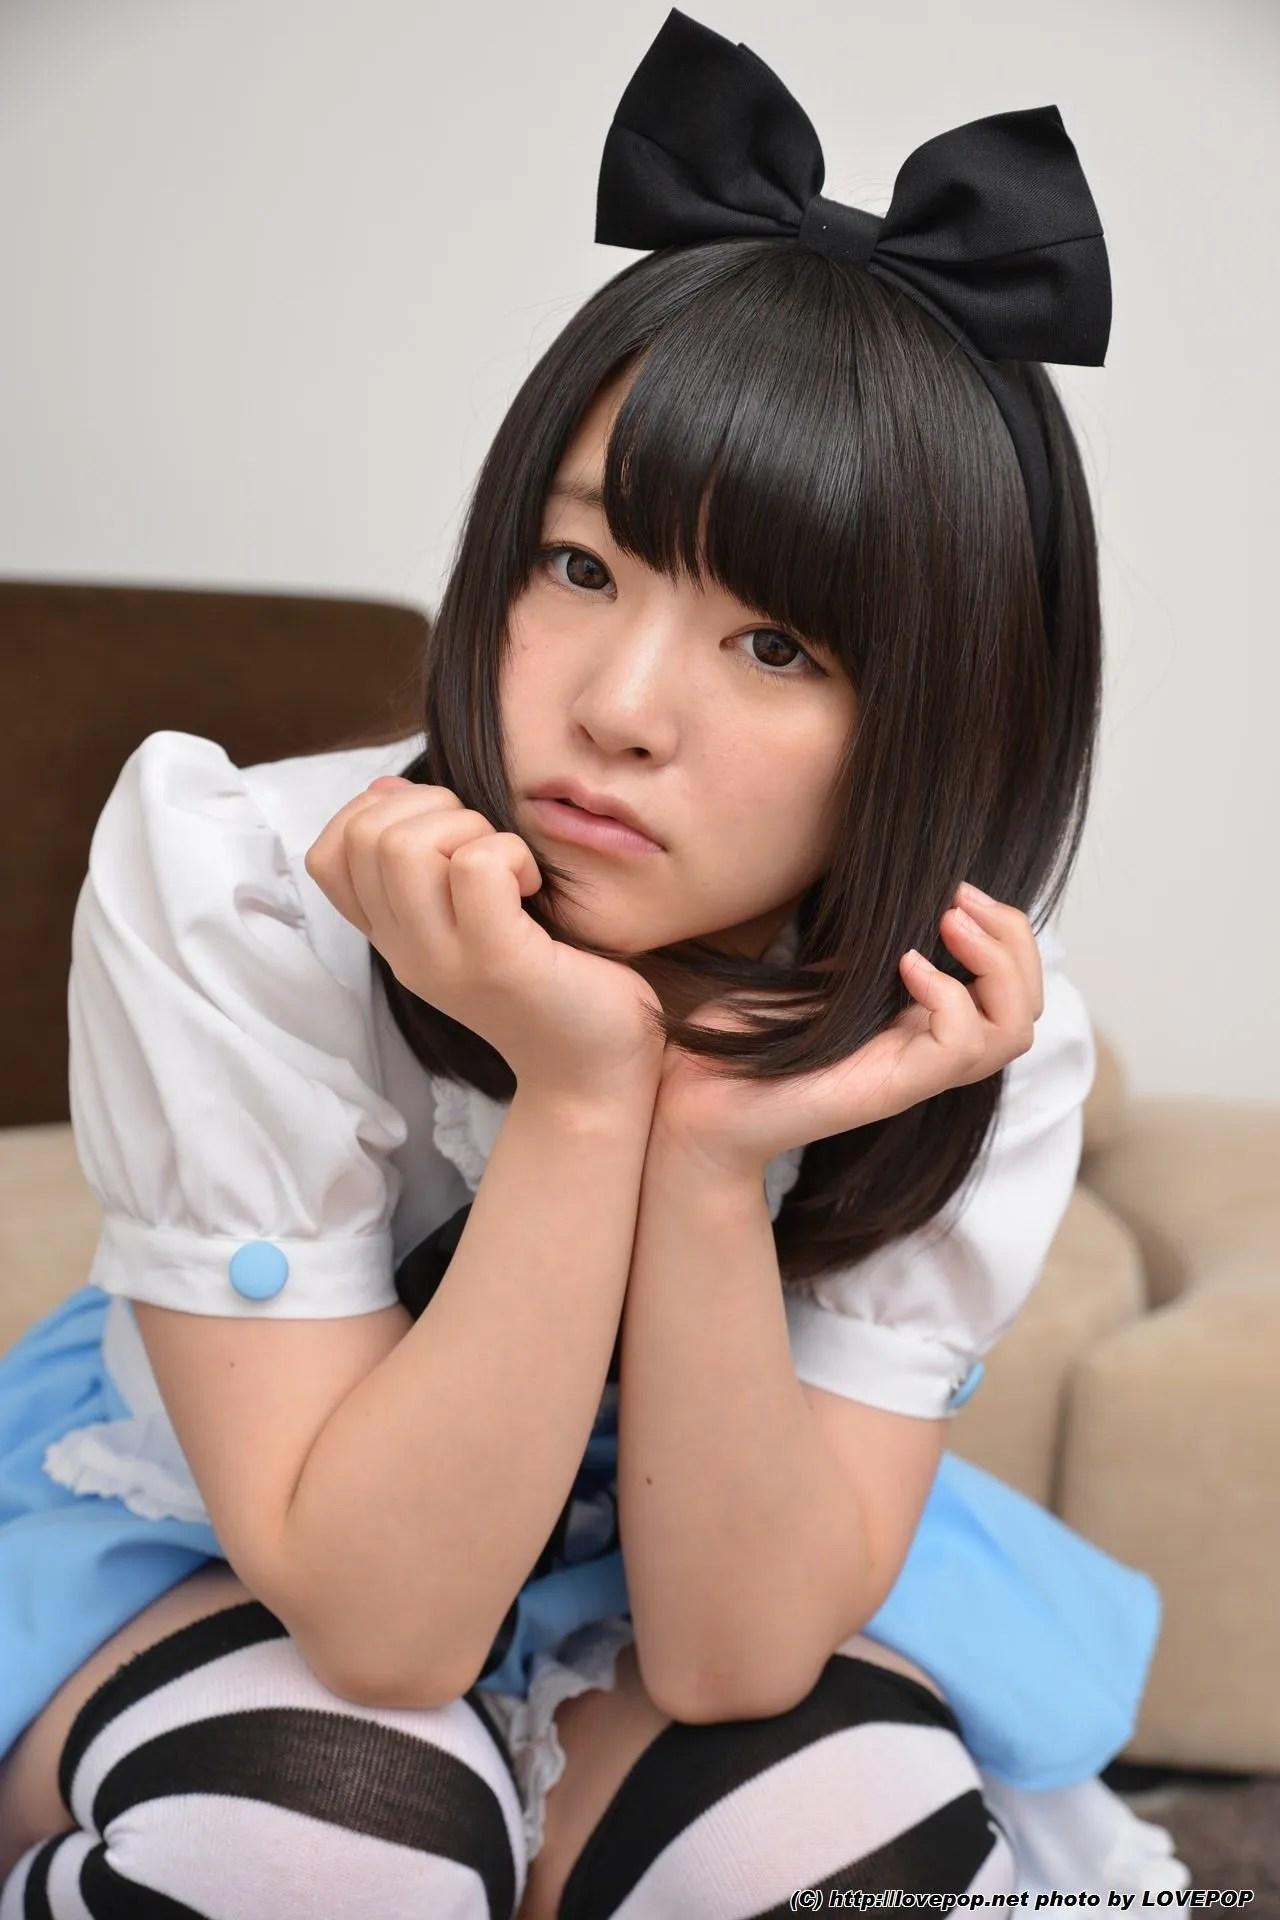 [LovePop] Tsuna Kimura 木村つな Maid Set03 写真集[65P]插图(11)